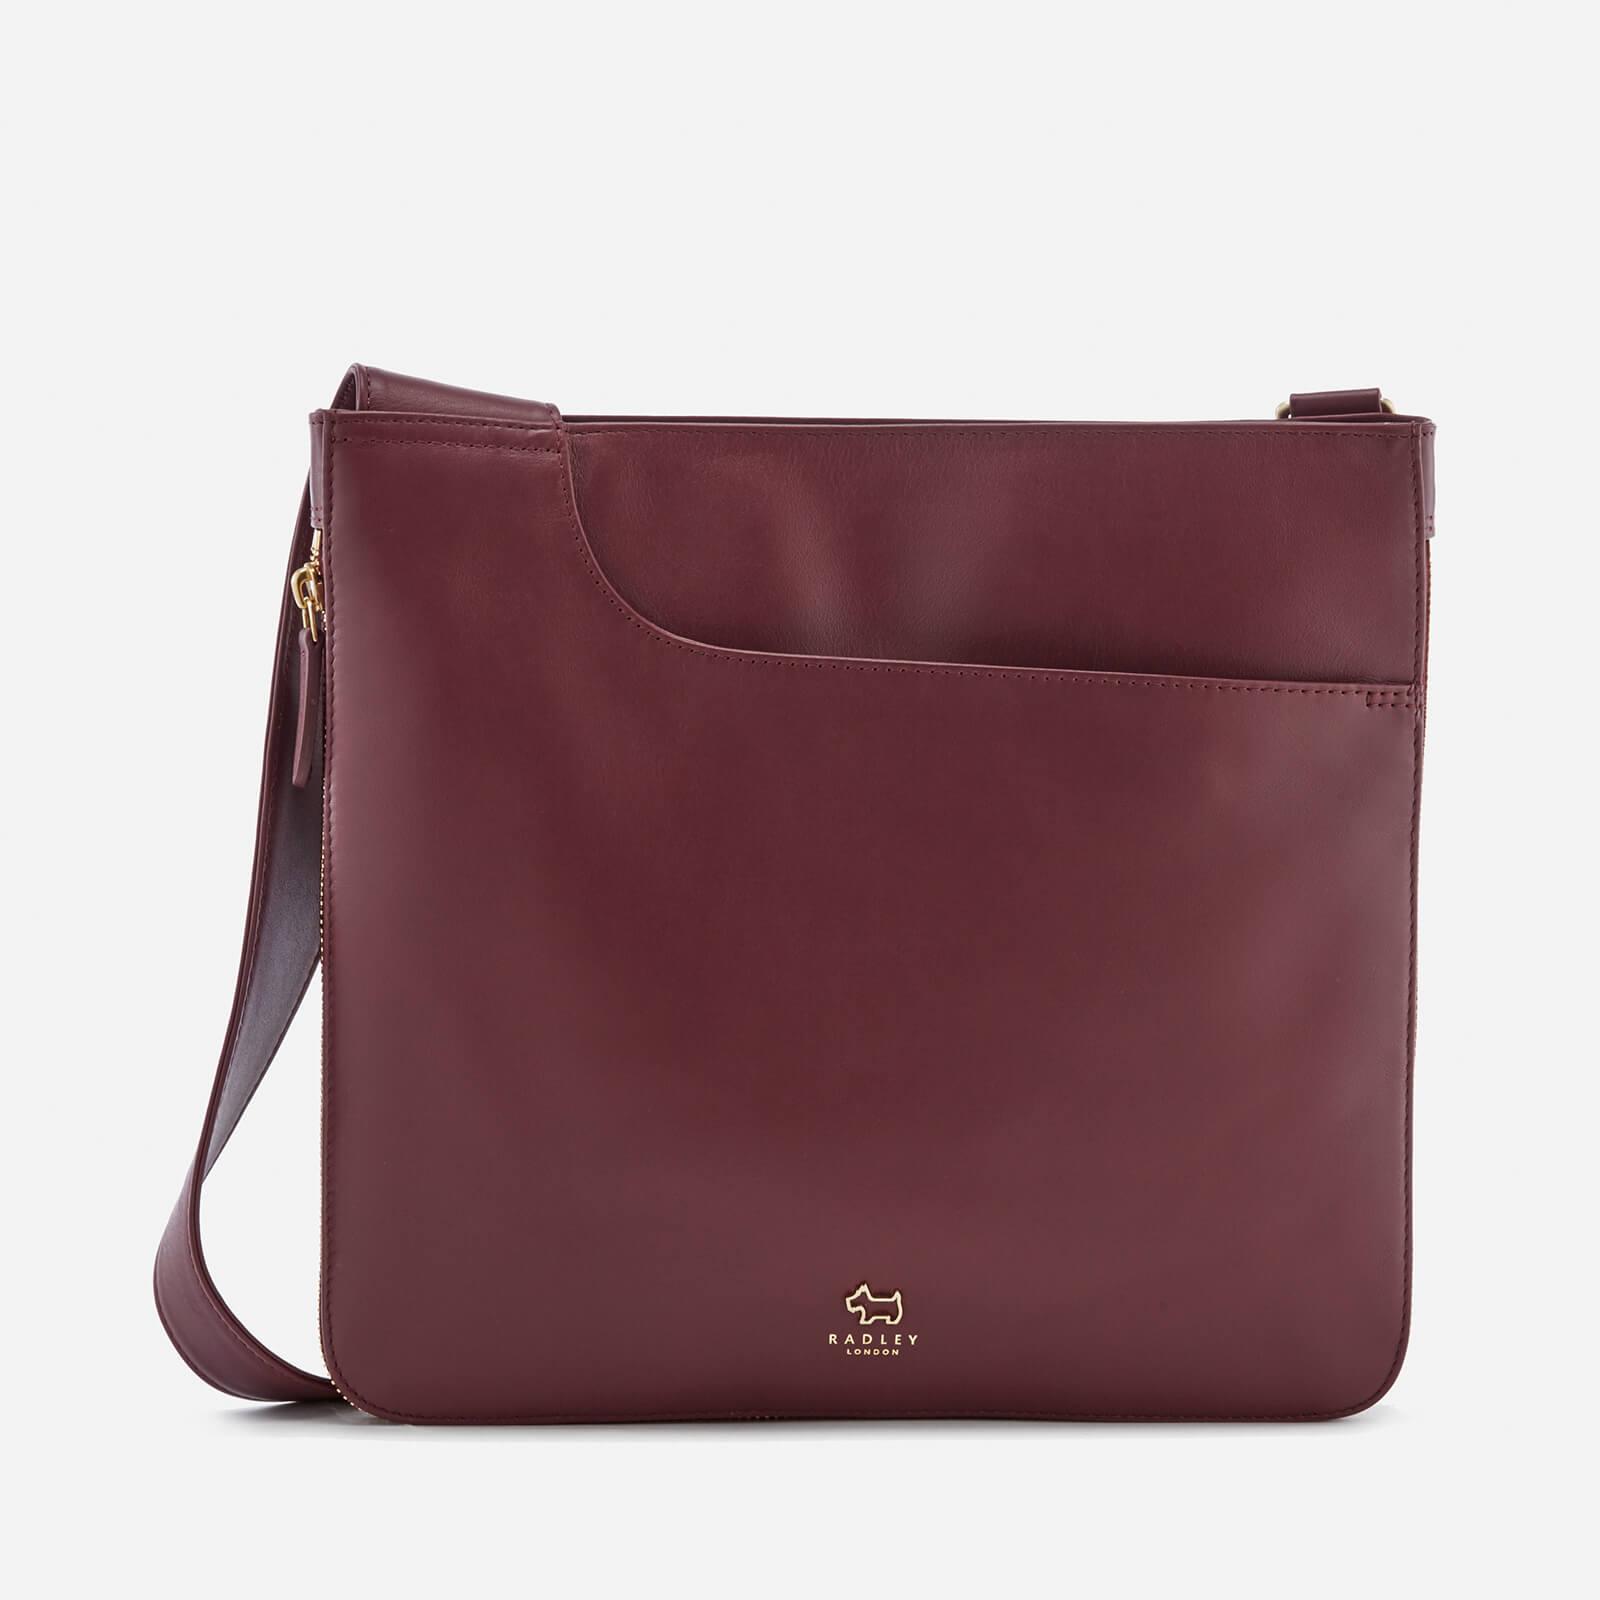 6391ed8b74cc09 Radley Large Pocket Across Body Bag